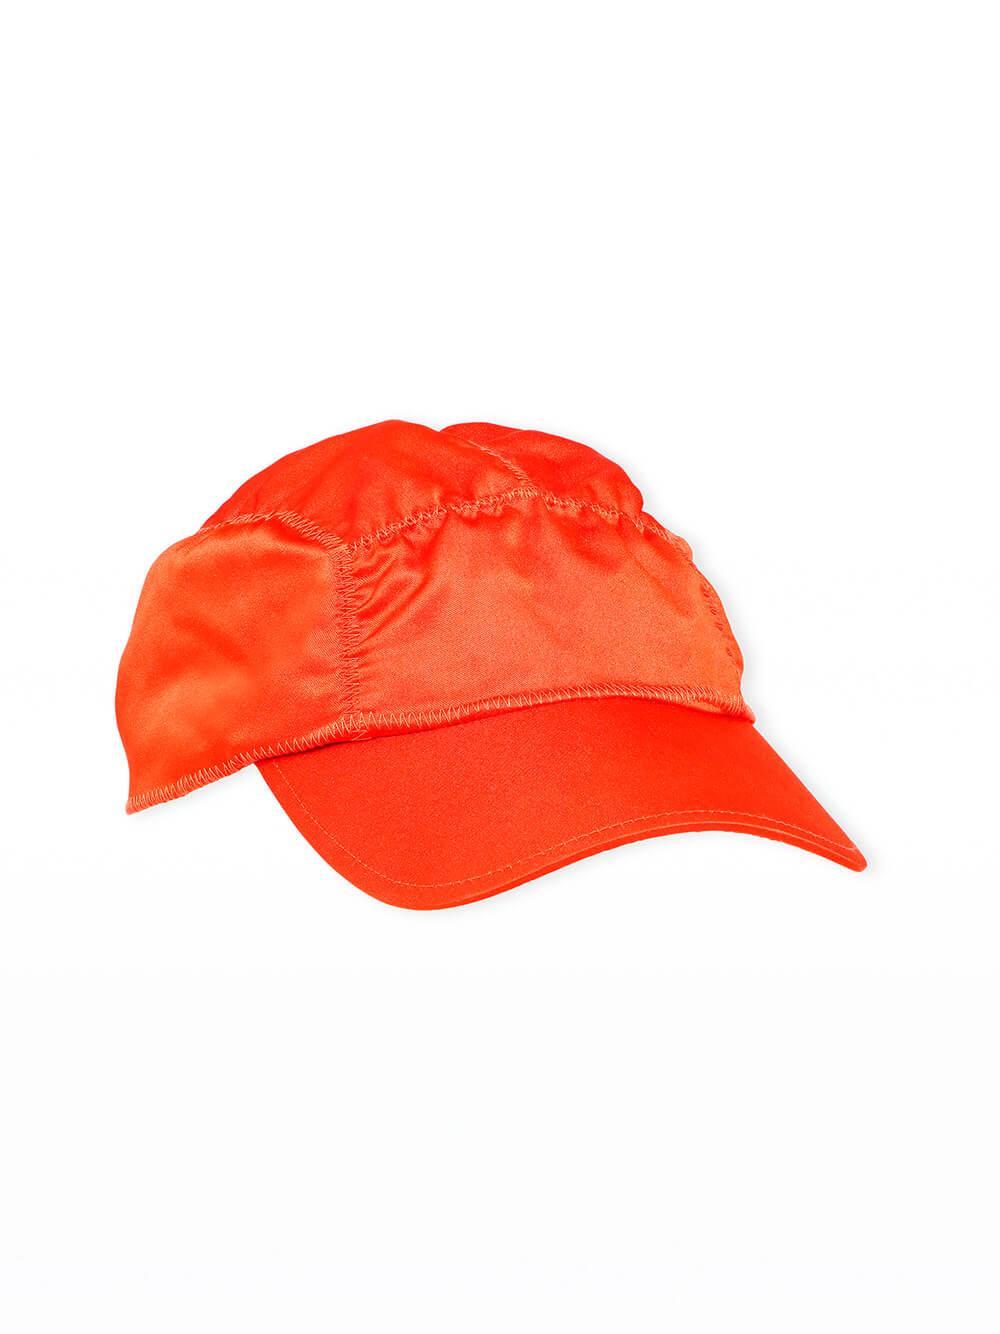 Satin Baseball Cap Item # A3328